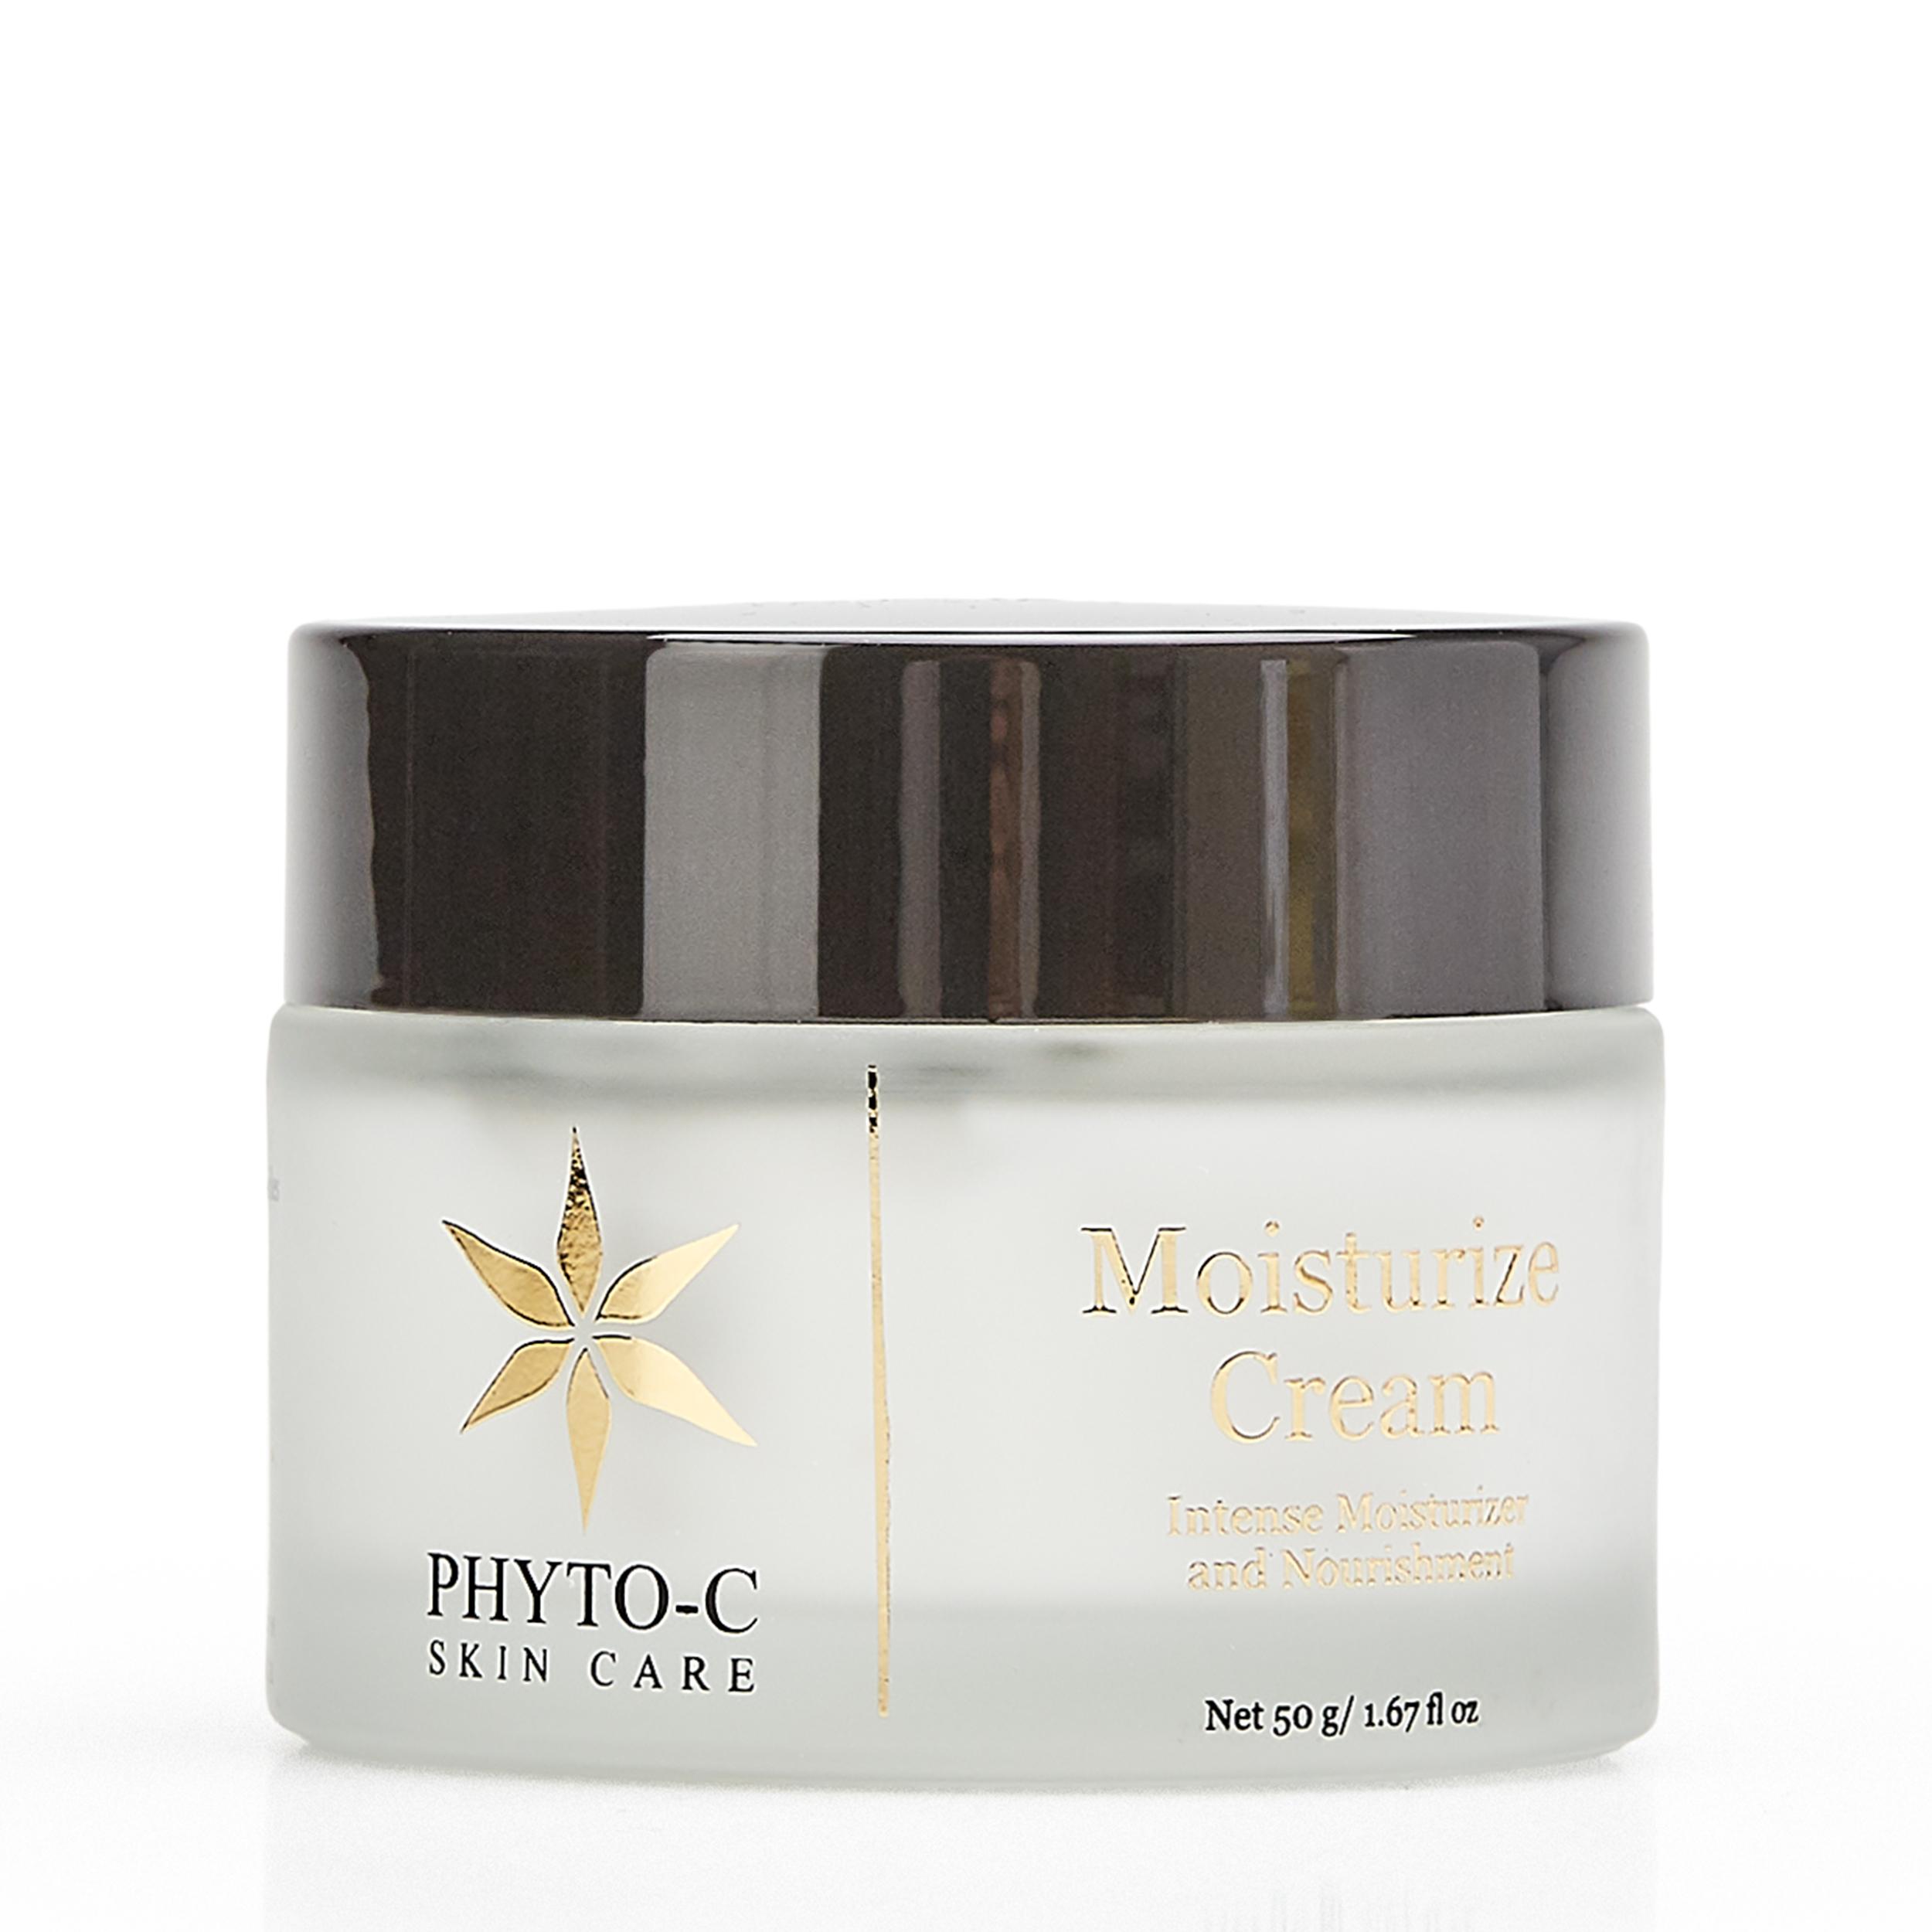 PHYTO-C Крем для лица Moisturize Cream 50 гр фото